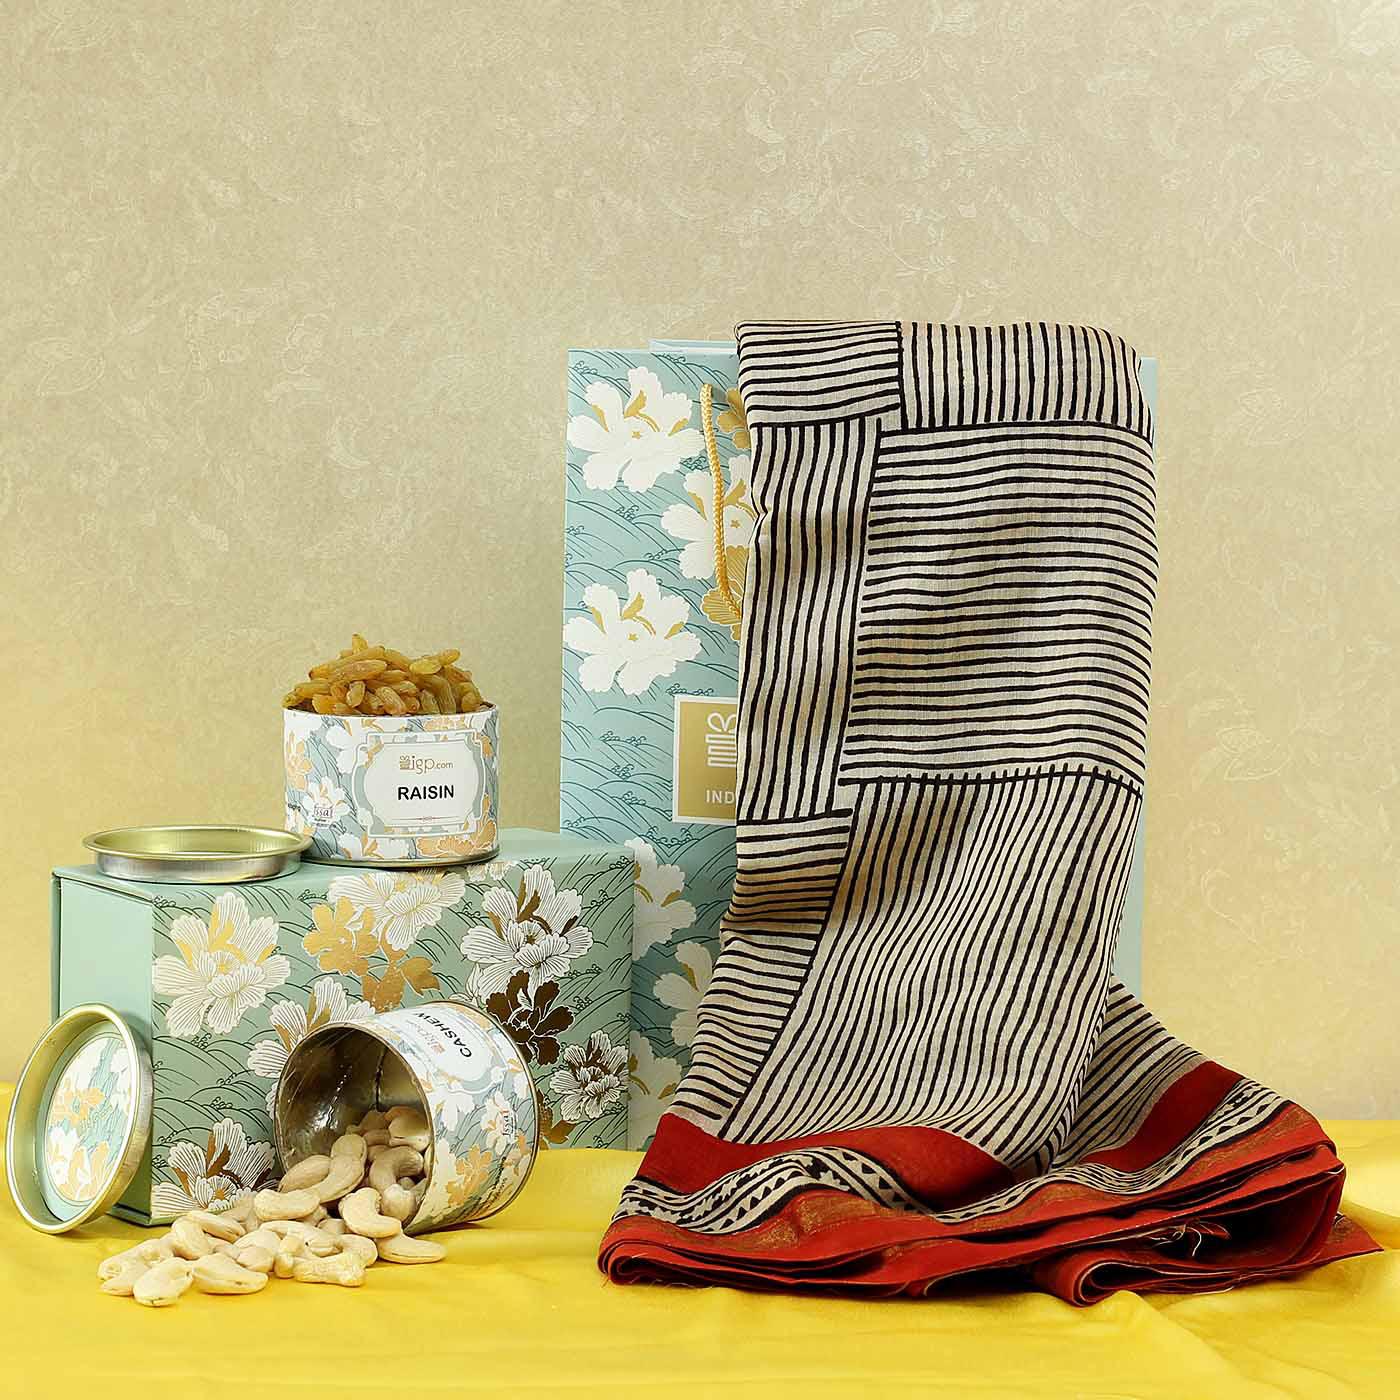 Chanderi Cotton Silk Saree with Dry Fruit Box